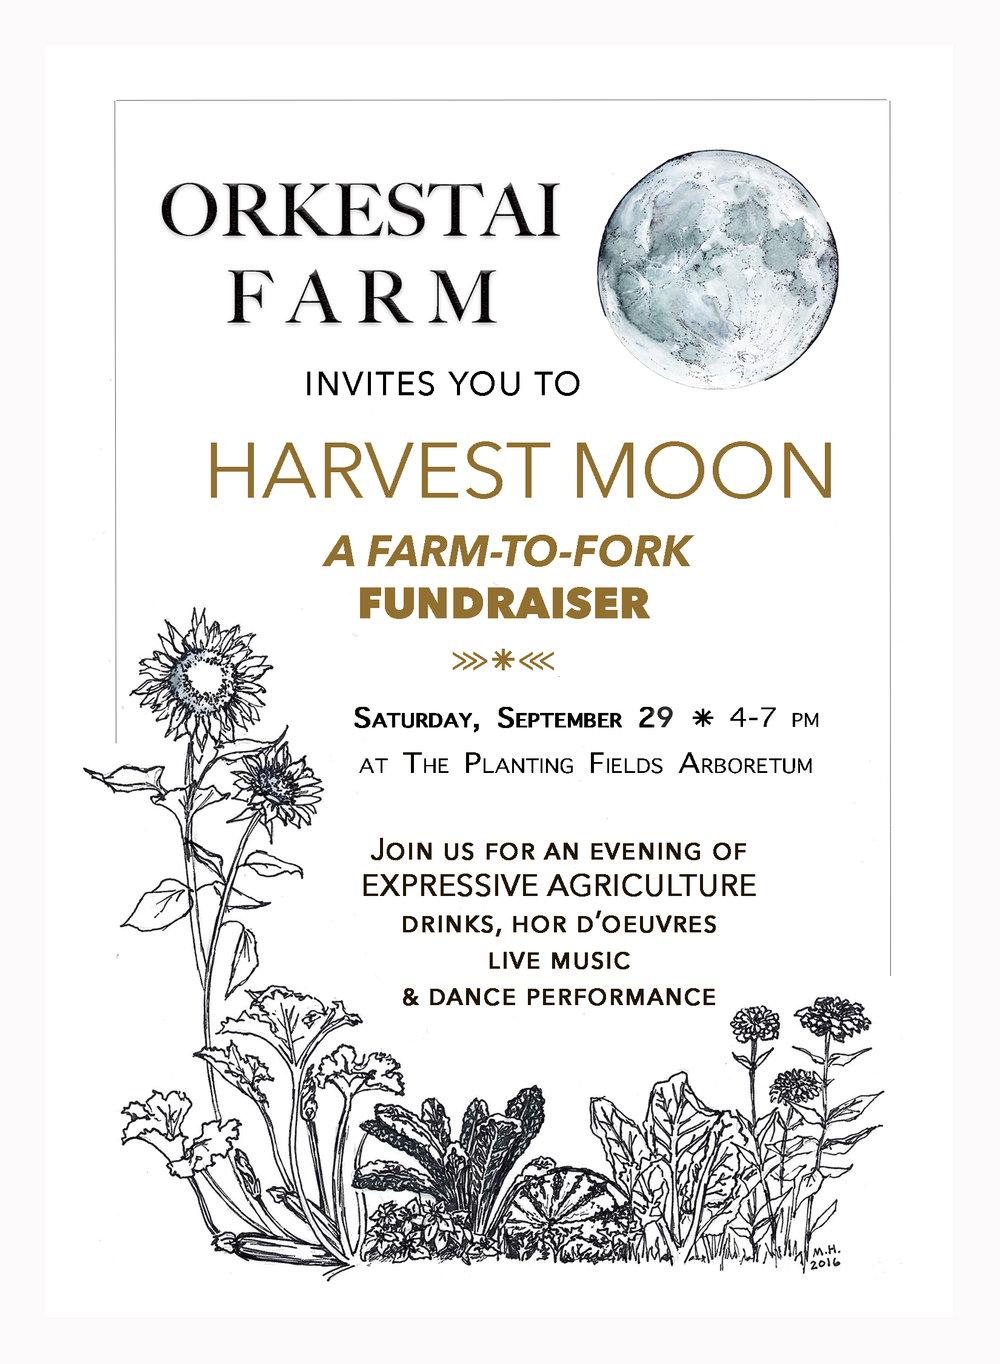 orkestai fundraiser invite front updated.jpg